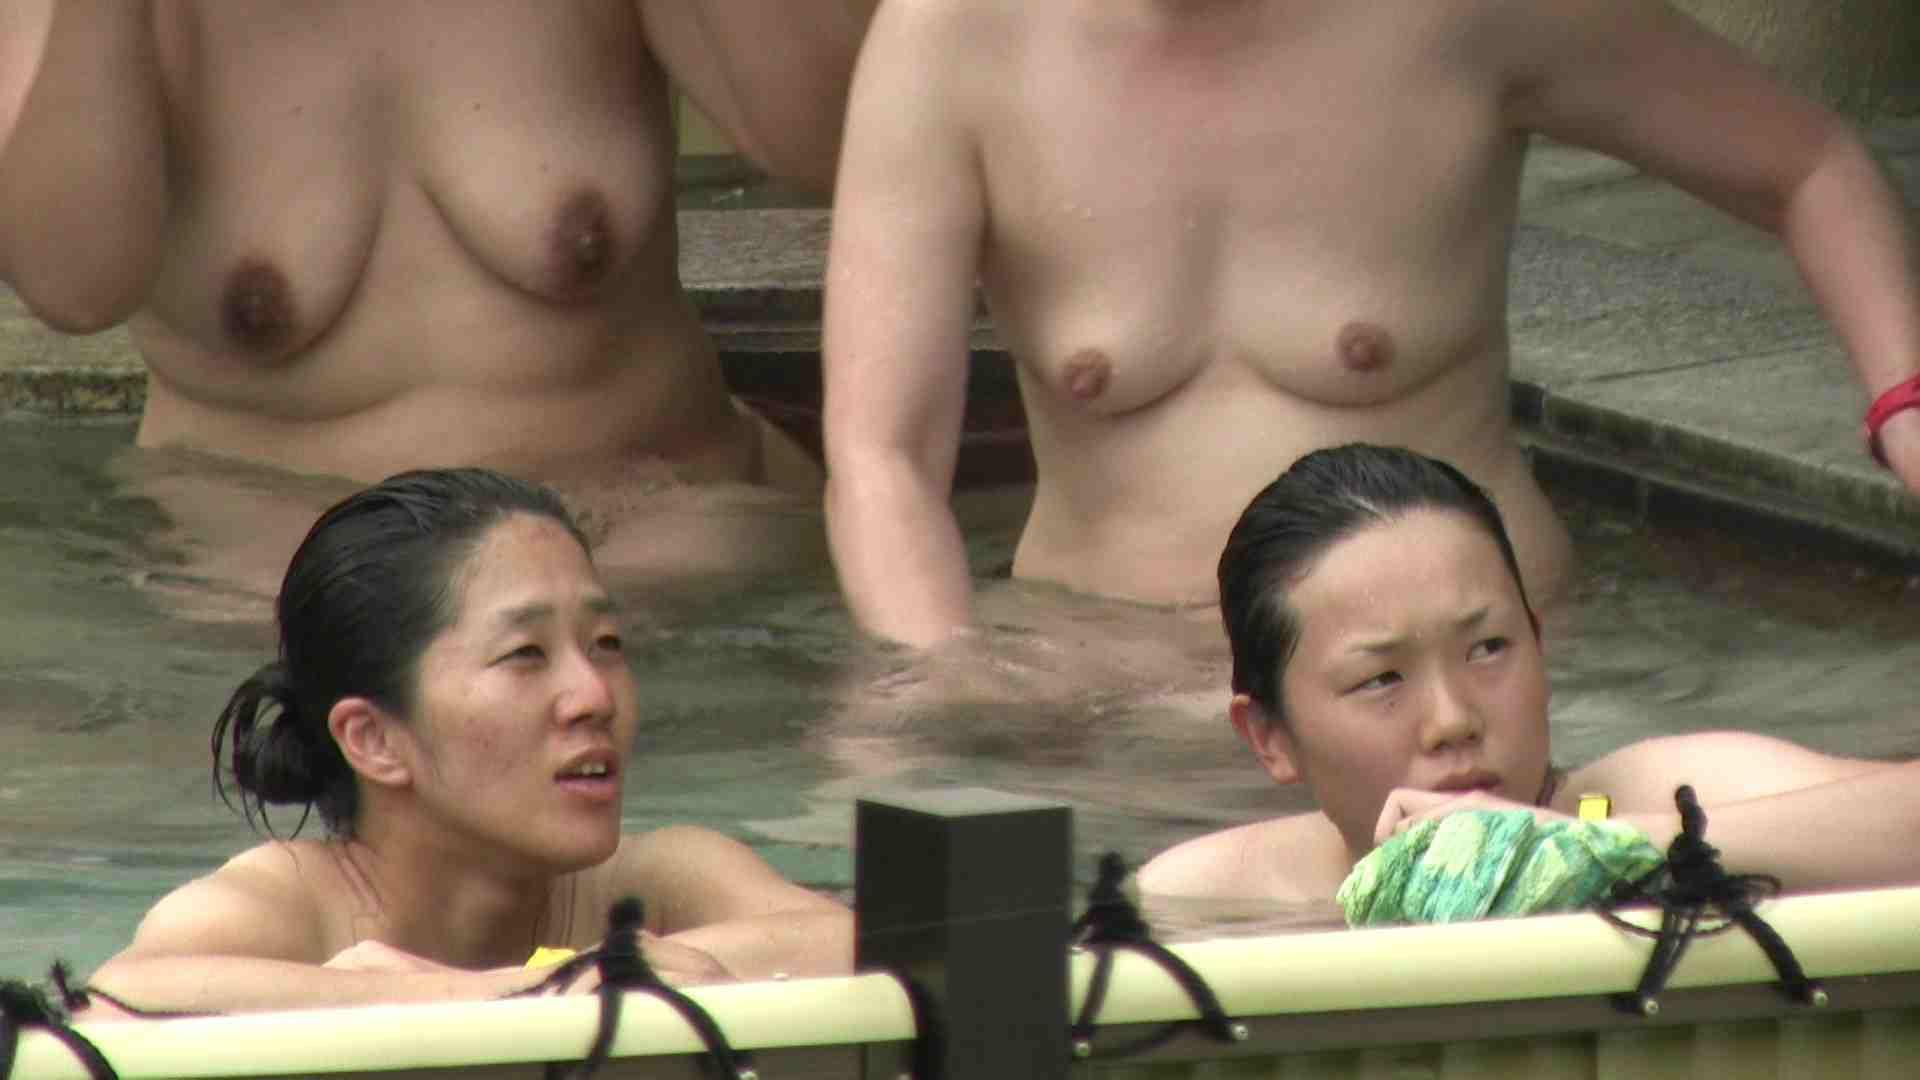 Aquaな露天風呂Vol.205 OLセックス 覗き性交動画流出 105画像 47